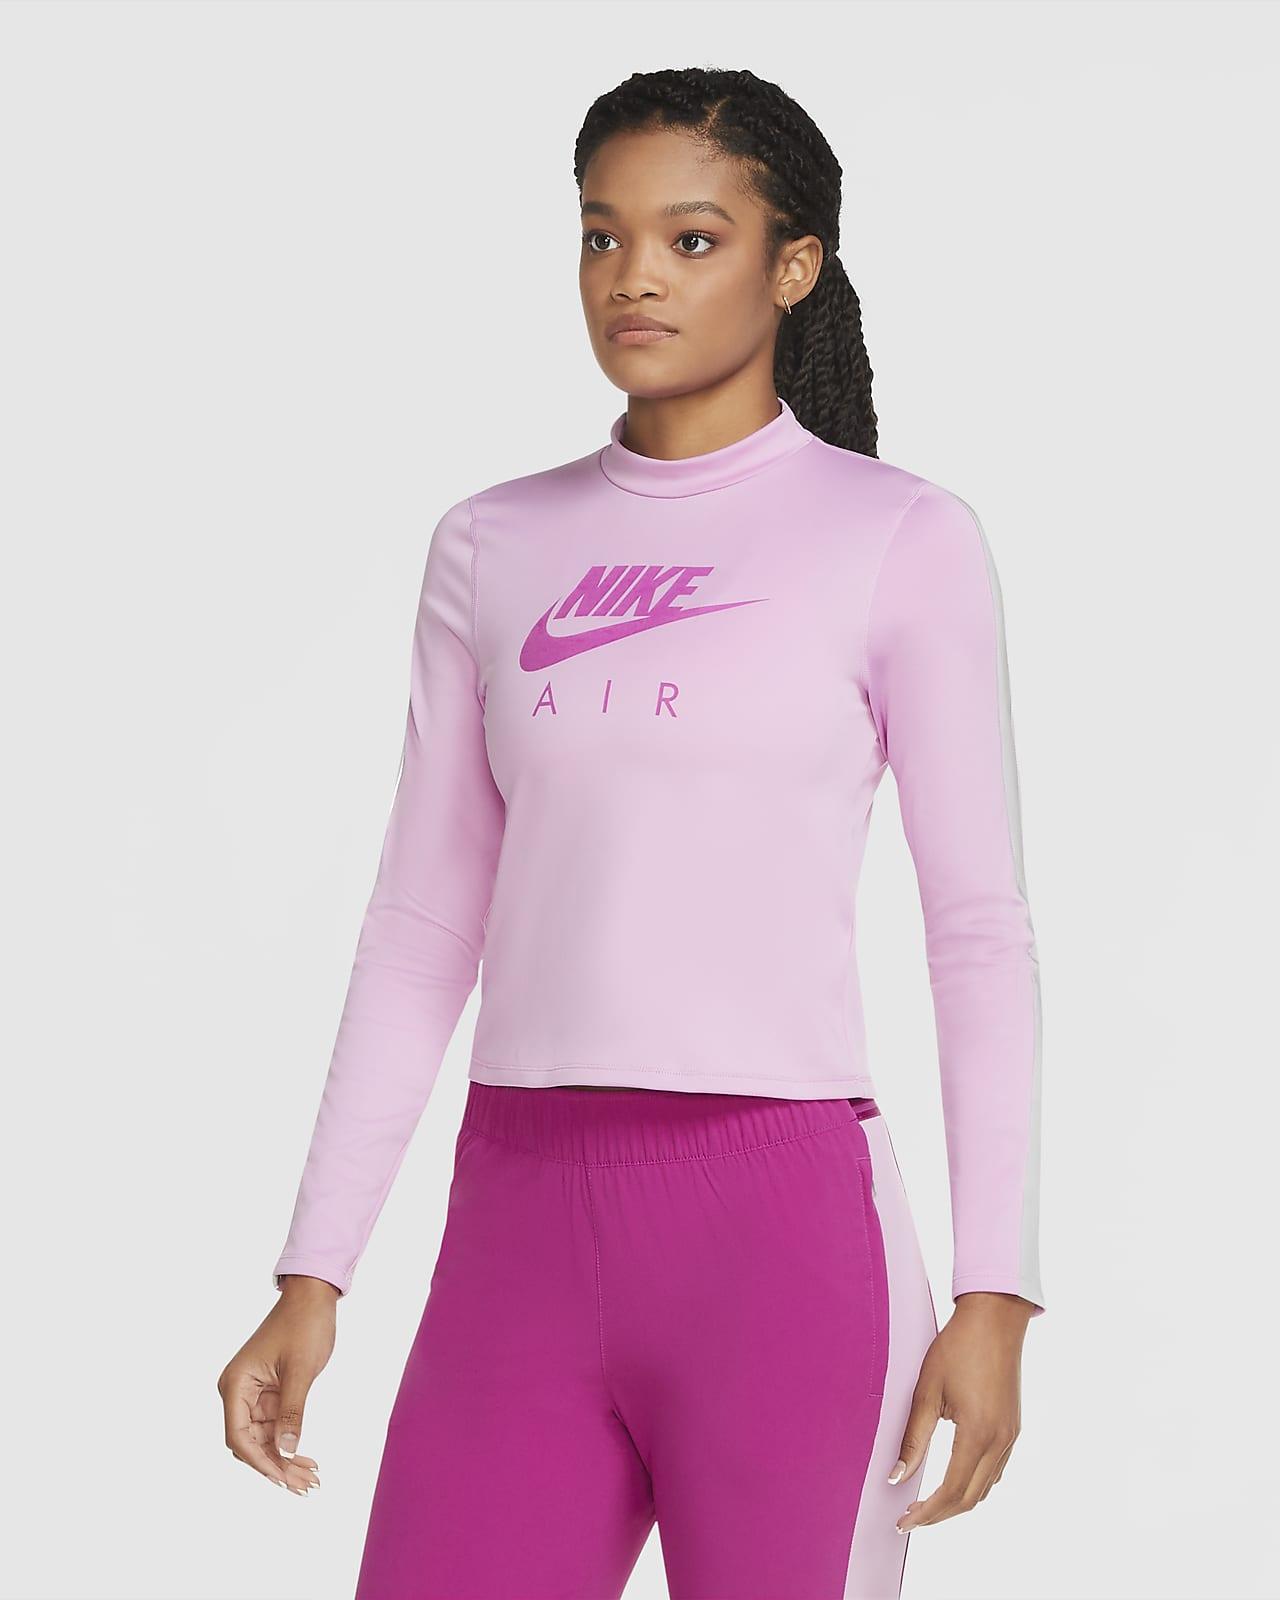 Damska koszulka z długim rękawem do biegania Nike Air